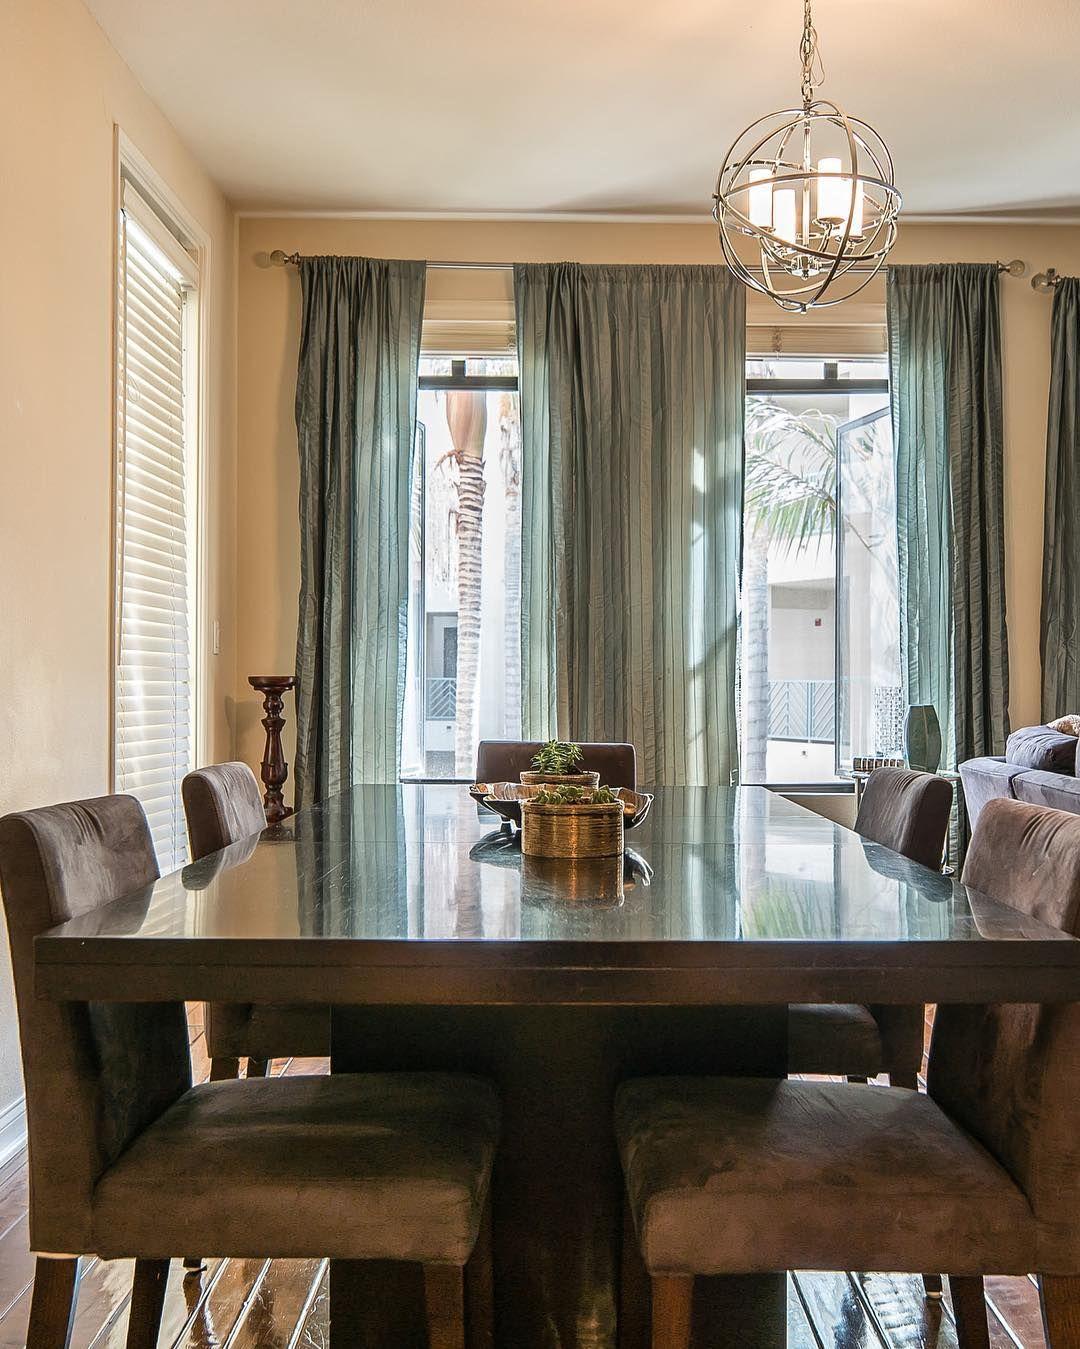 Home Decoratingtips